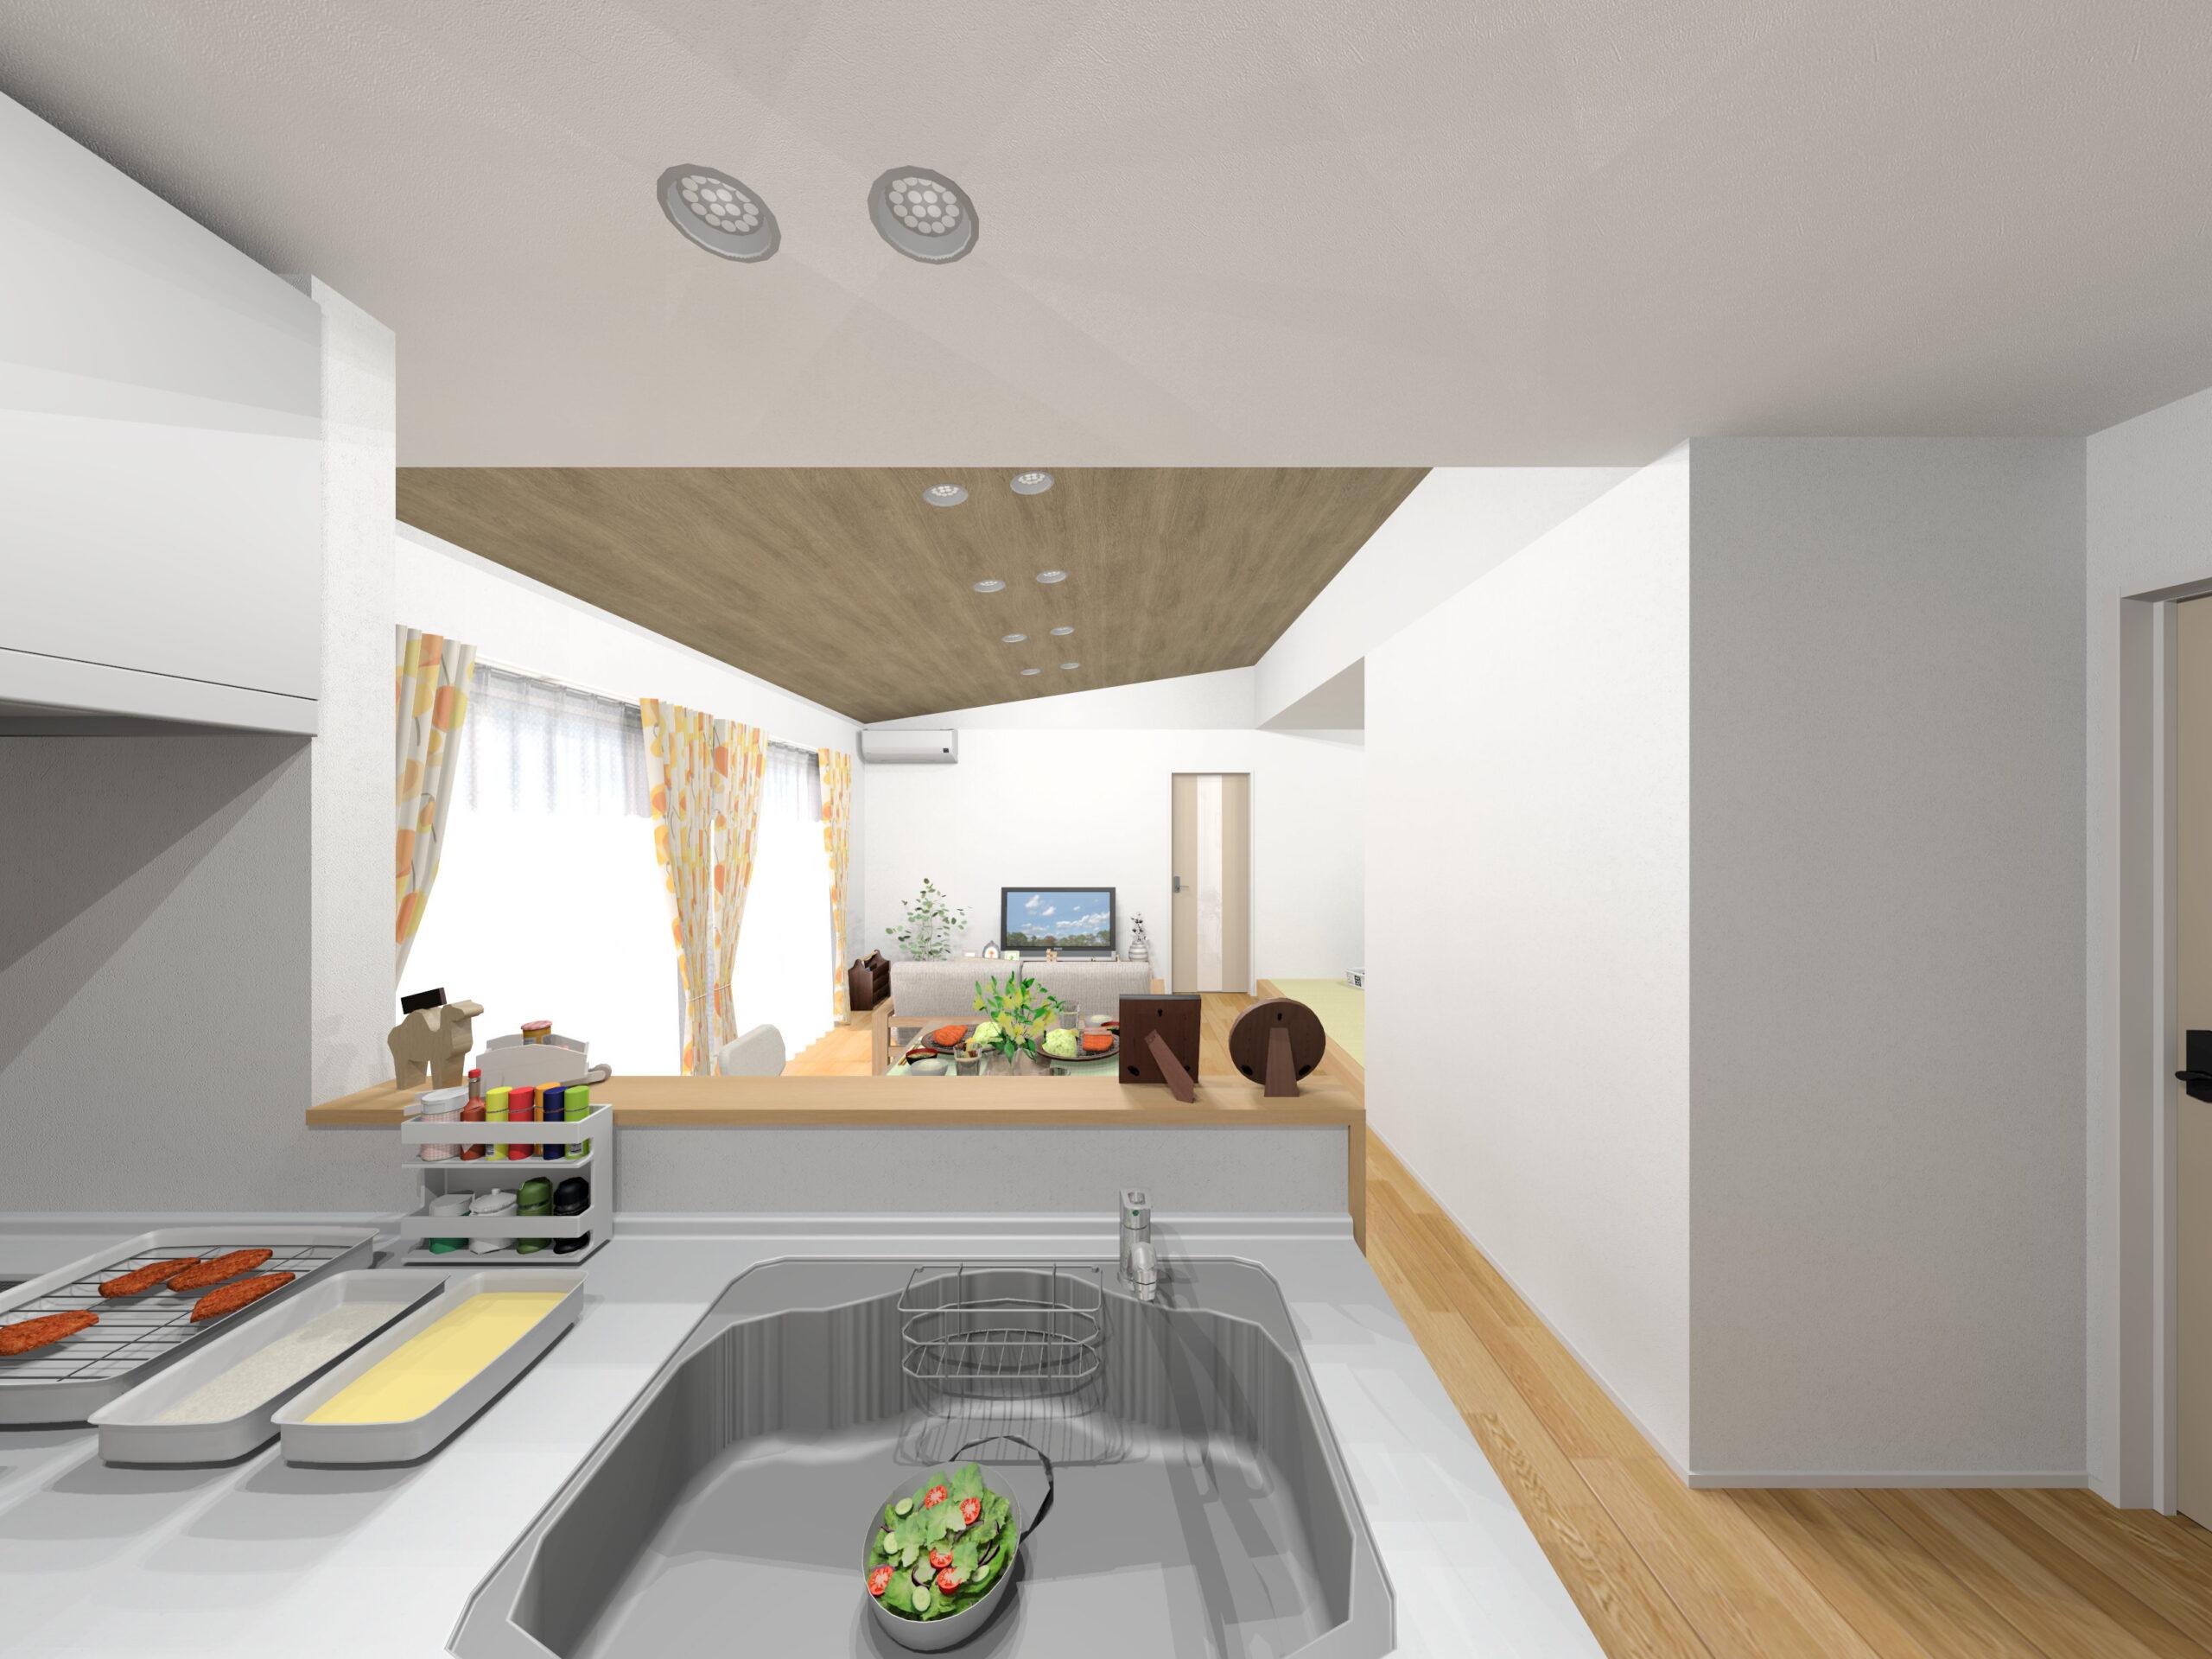 嬉野市新築建売住宅「OURS下宿」4号地LDKパース